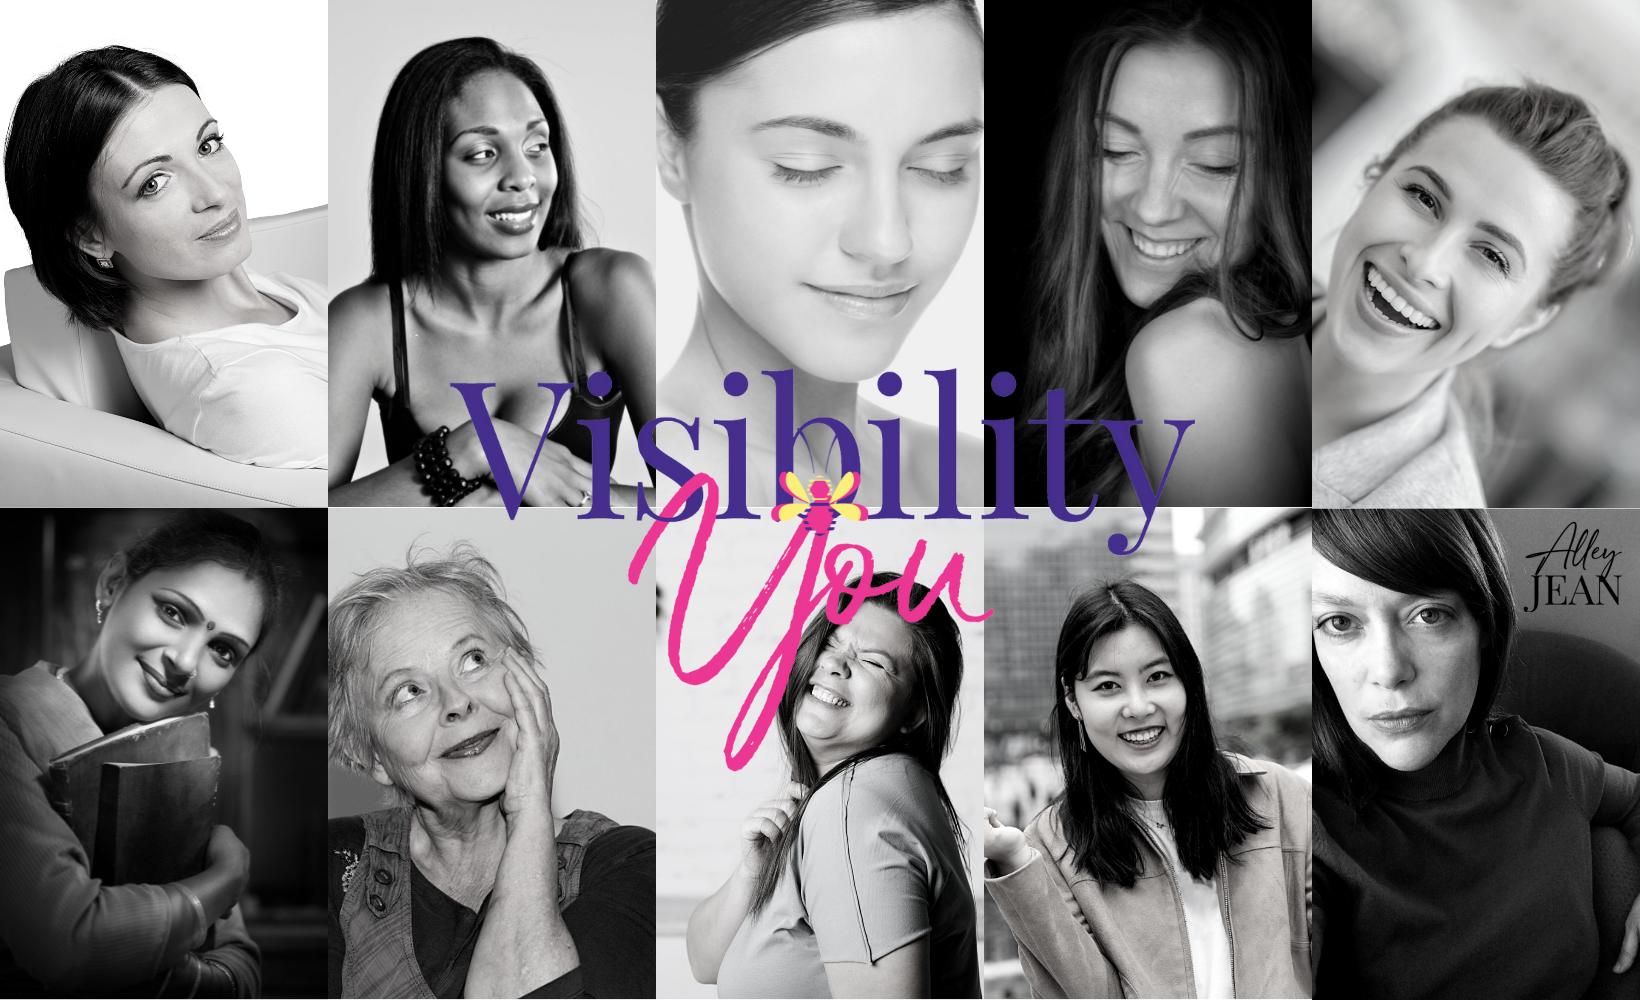 visibilityyou-facebook-group-cover-art